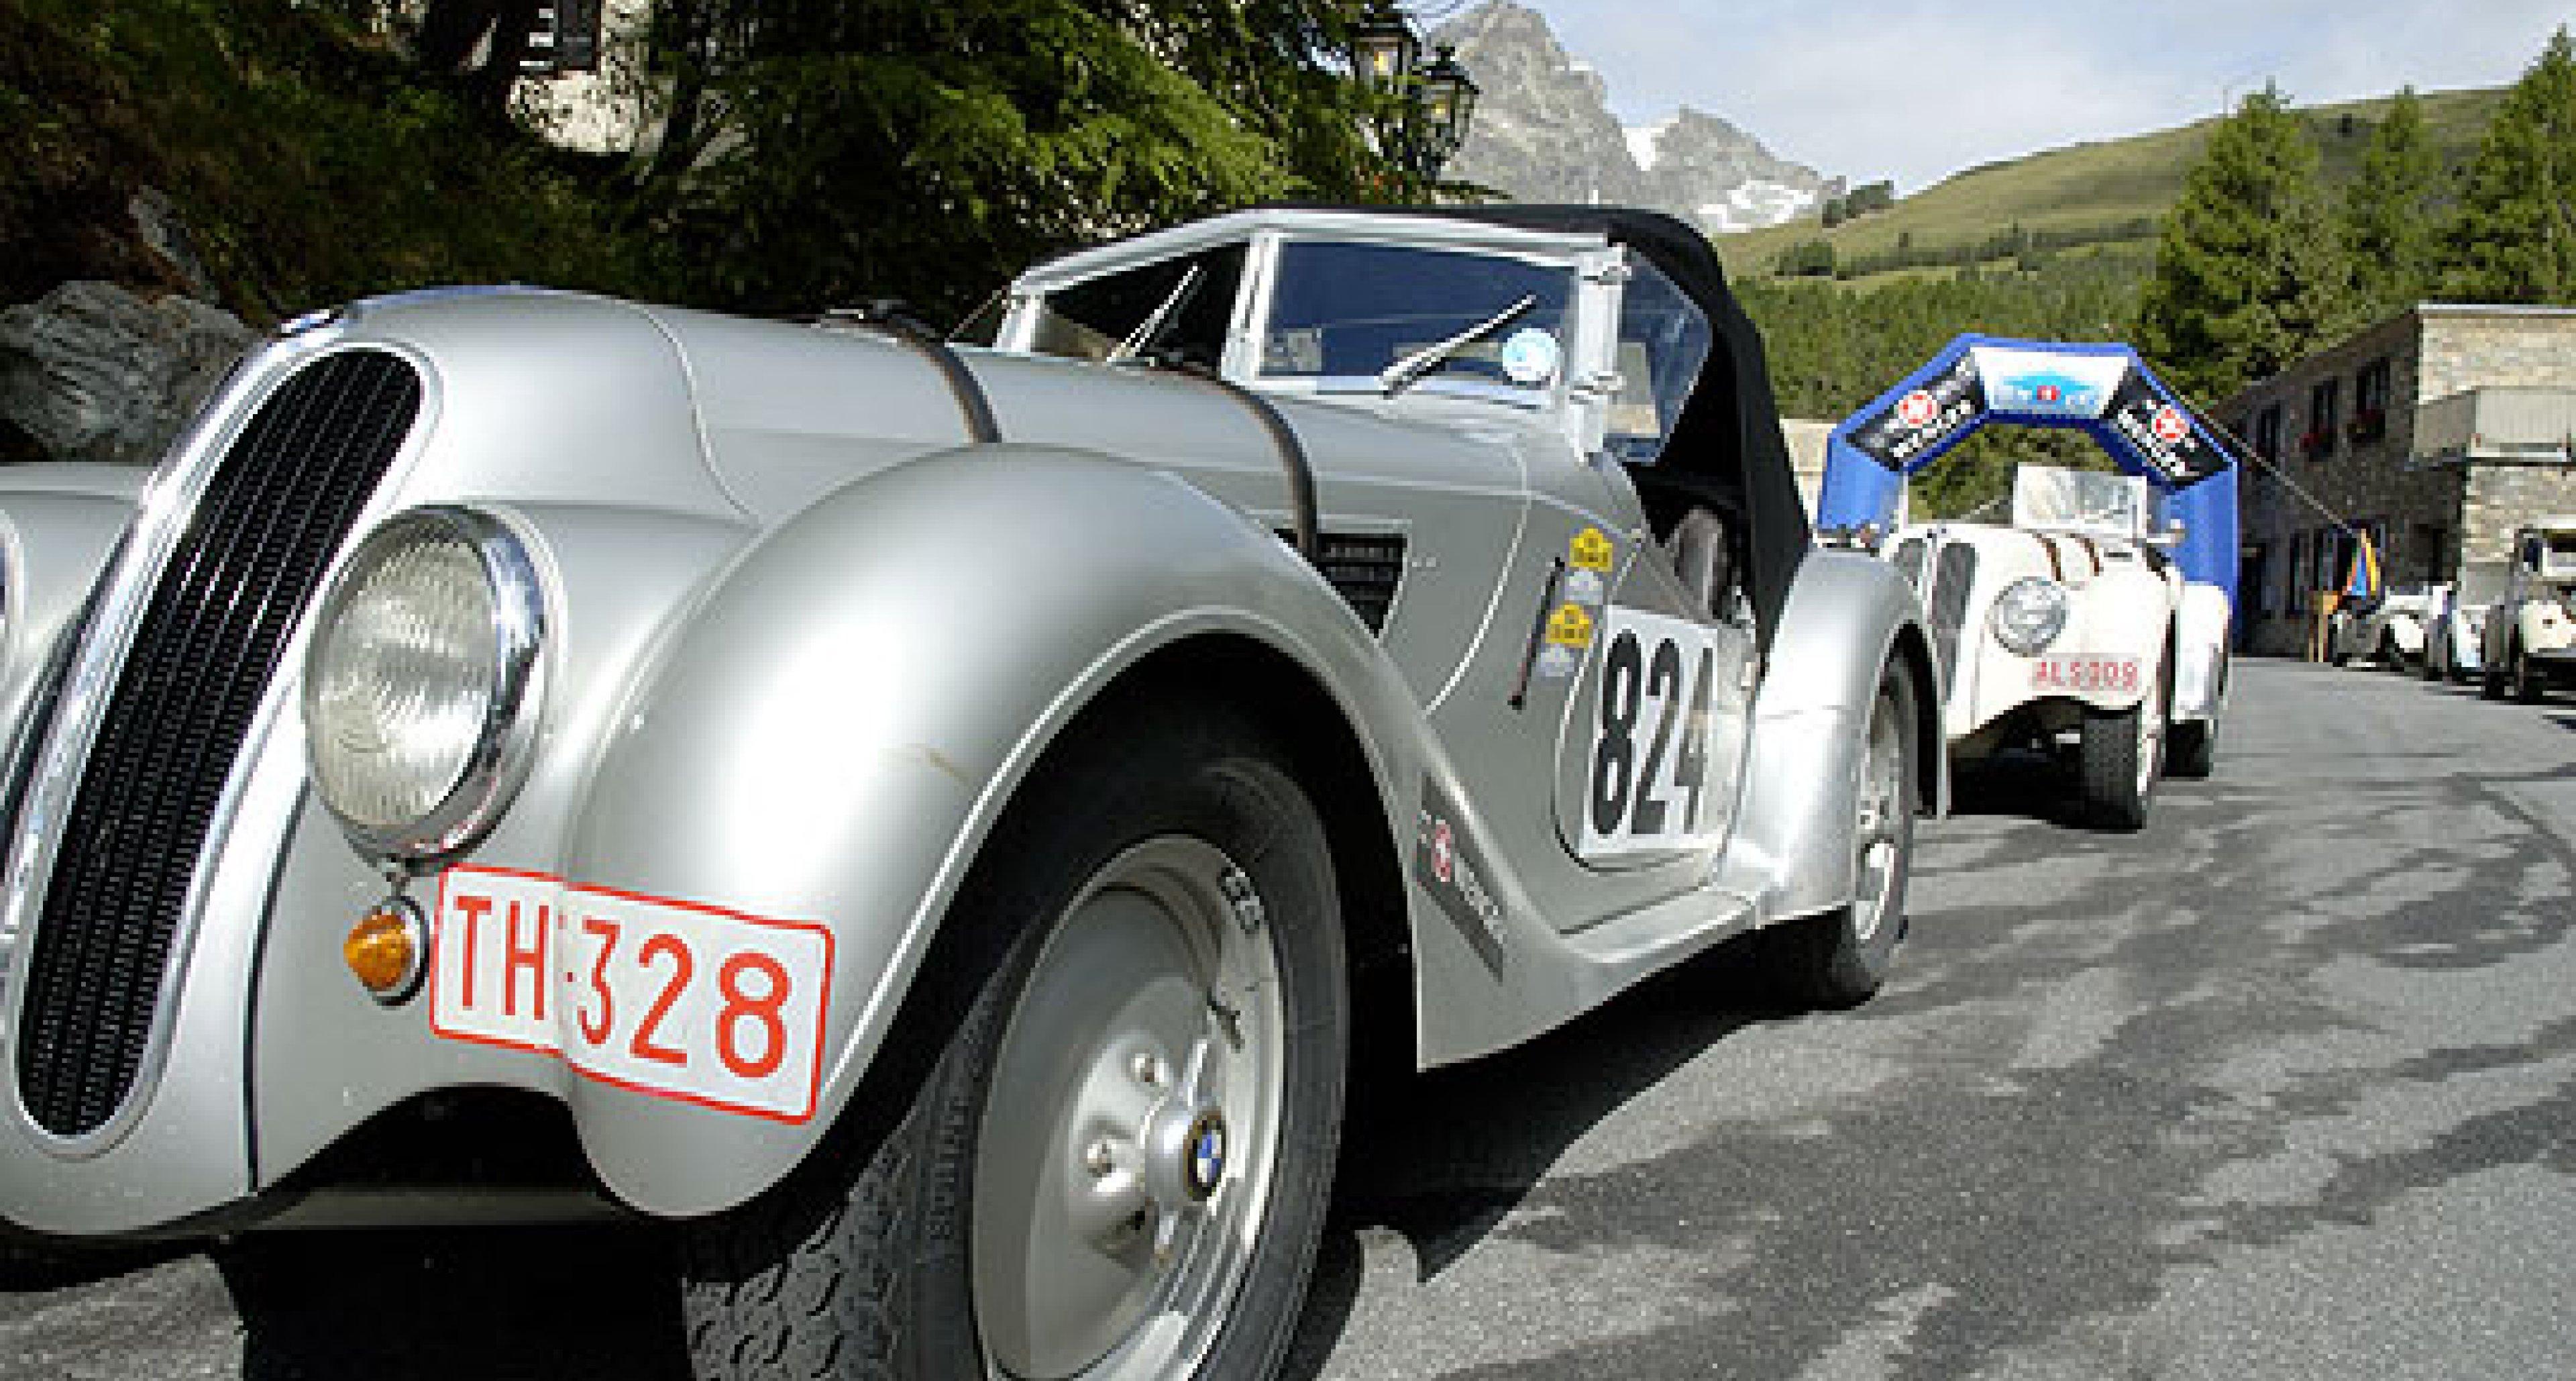 49. Rallye International des Alpes Historique